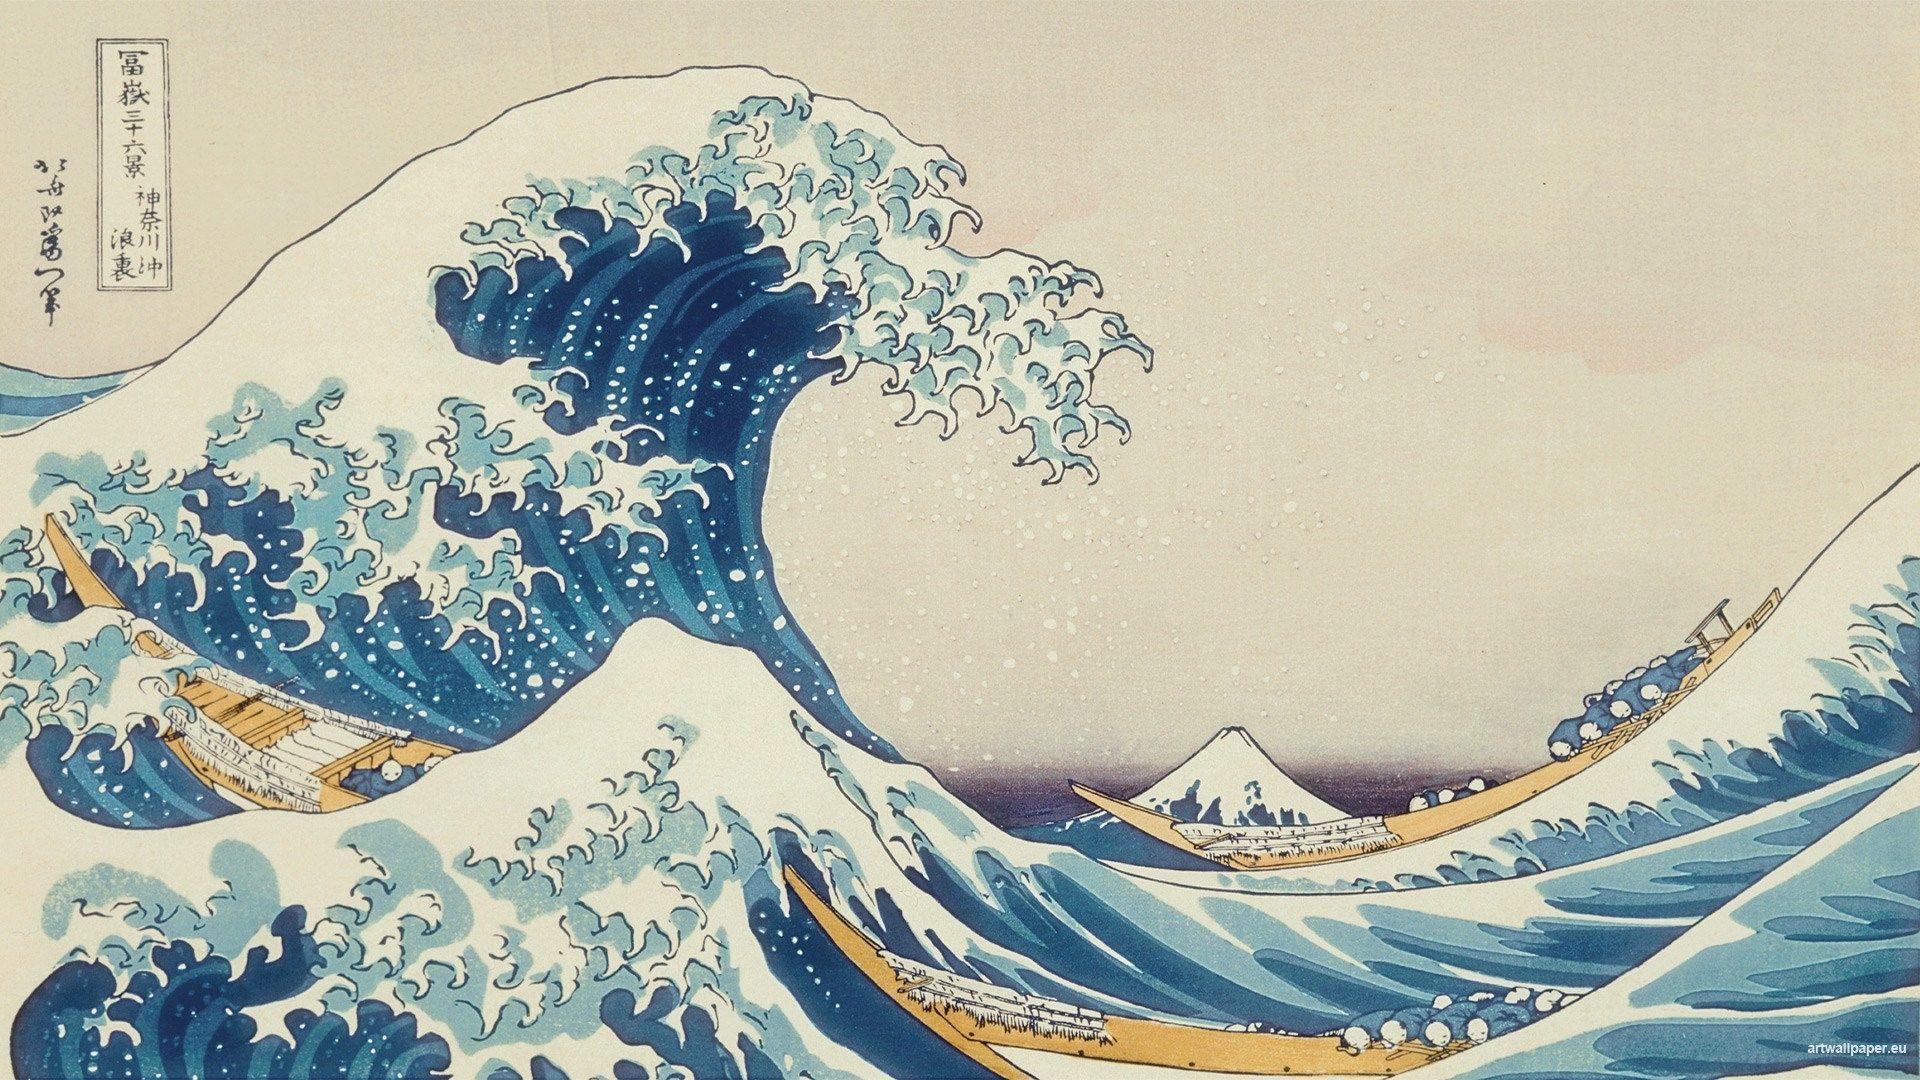 Japanese Art Desktop Wallpapers Top Free Japanese Art Desktop Backgrounds Wallpaperaccess